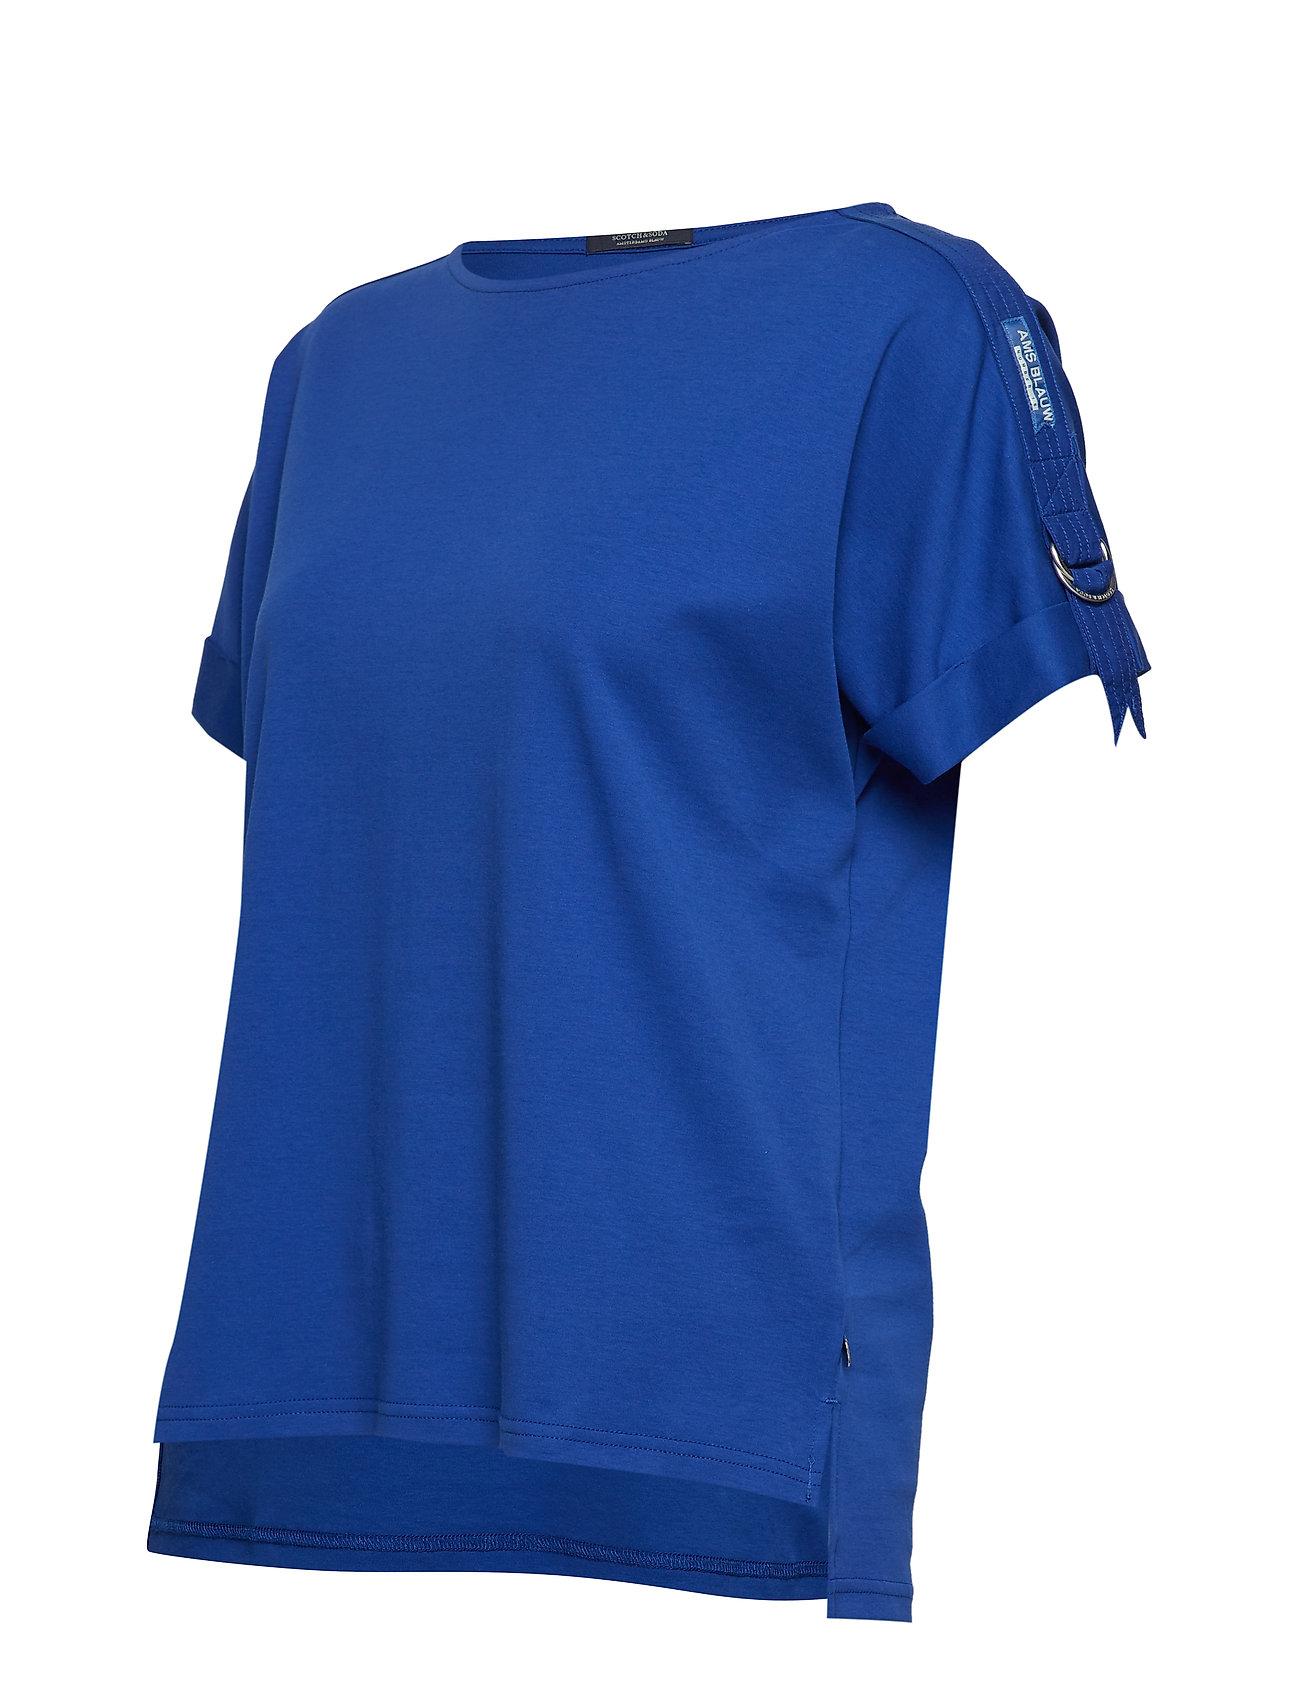 Soda Sleeves BlueScotchamp; Clean Seasonal Adjustable With Qualityyinmin Tee In rdoBWxeC